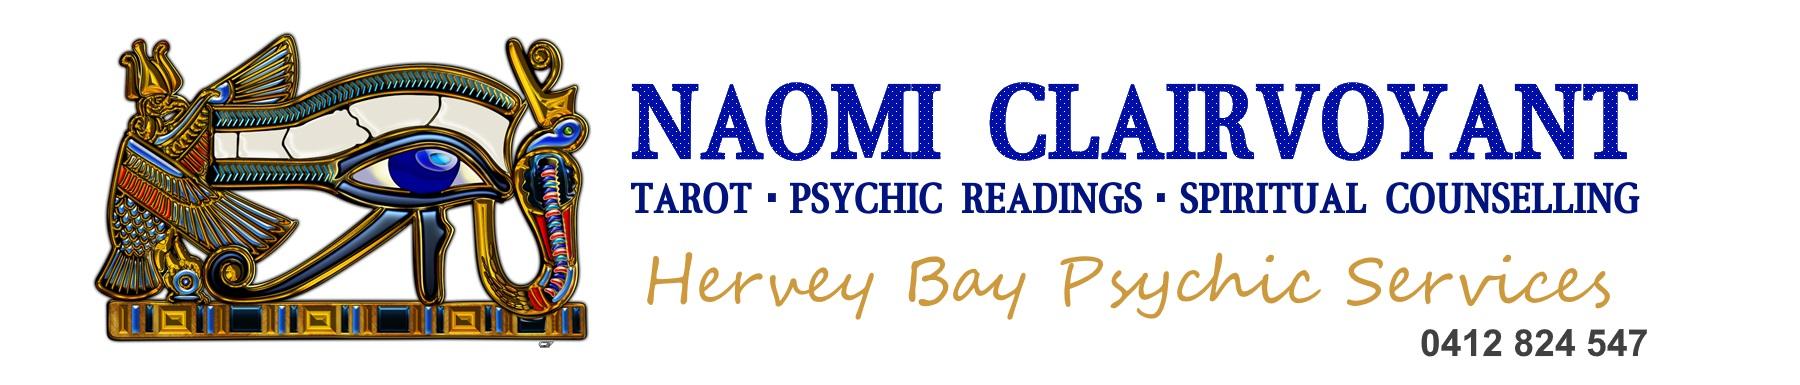 Naomi Clairvoyant - Hervey Bay Psychic, Maryborough, Wide Bay